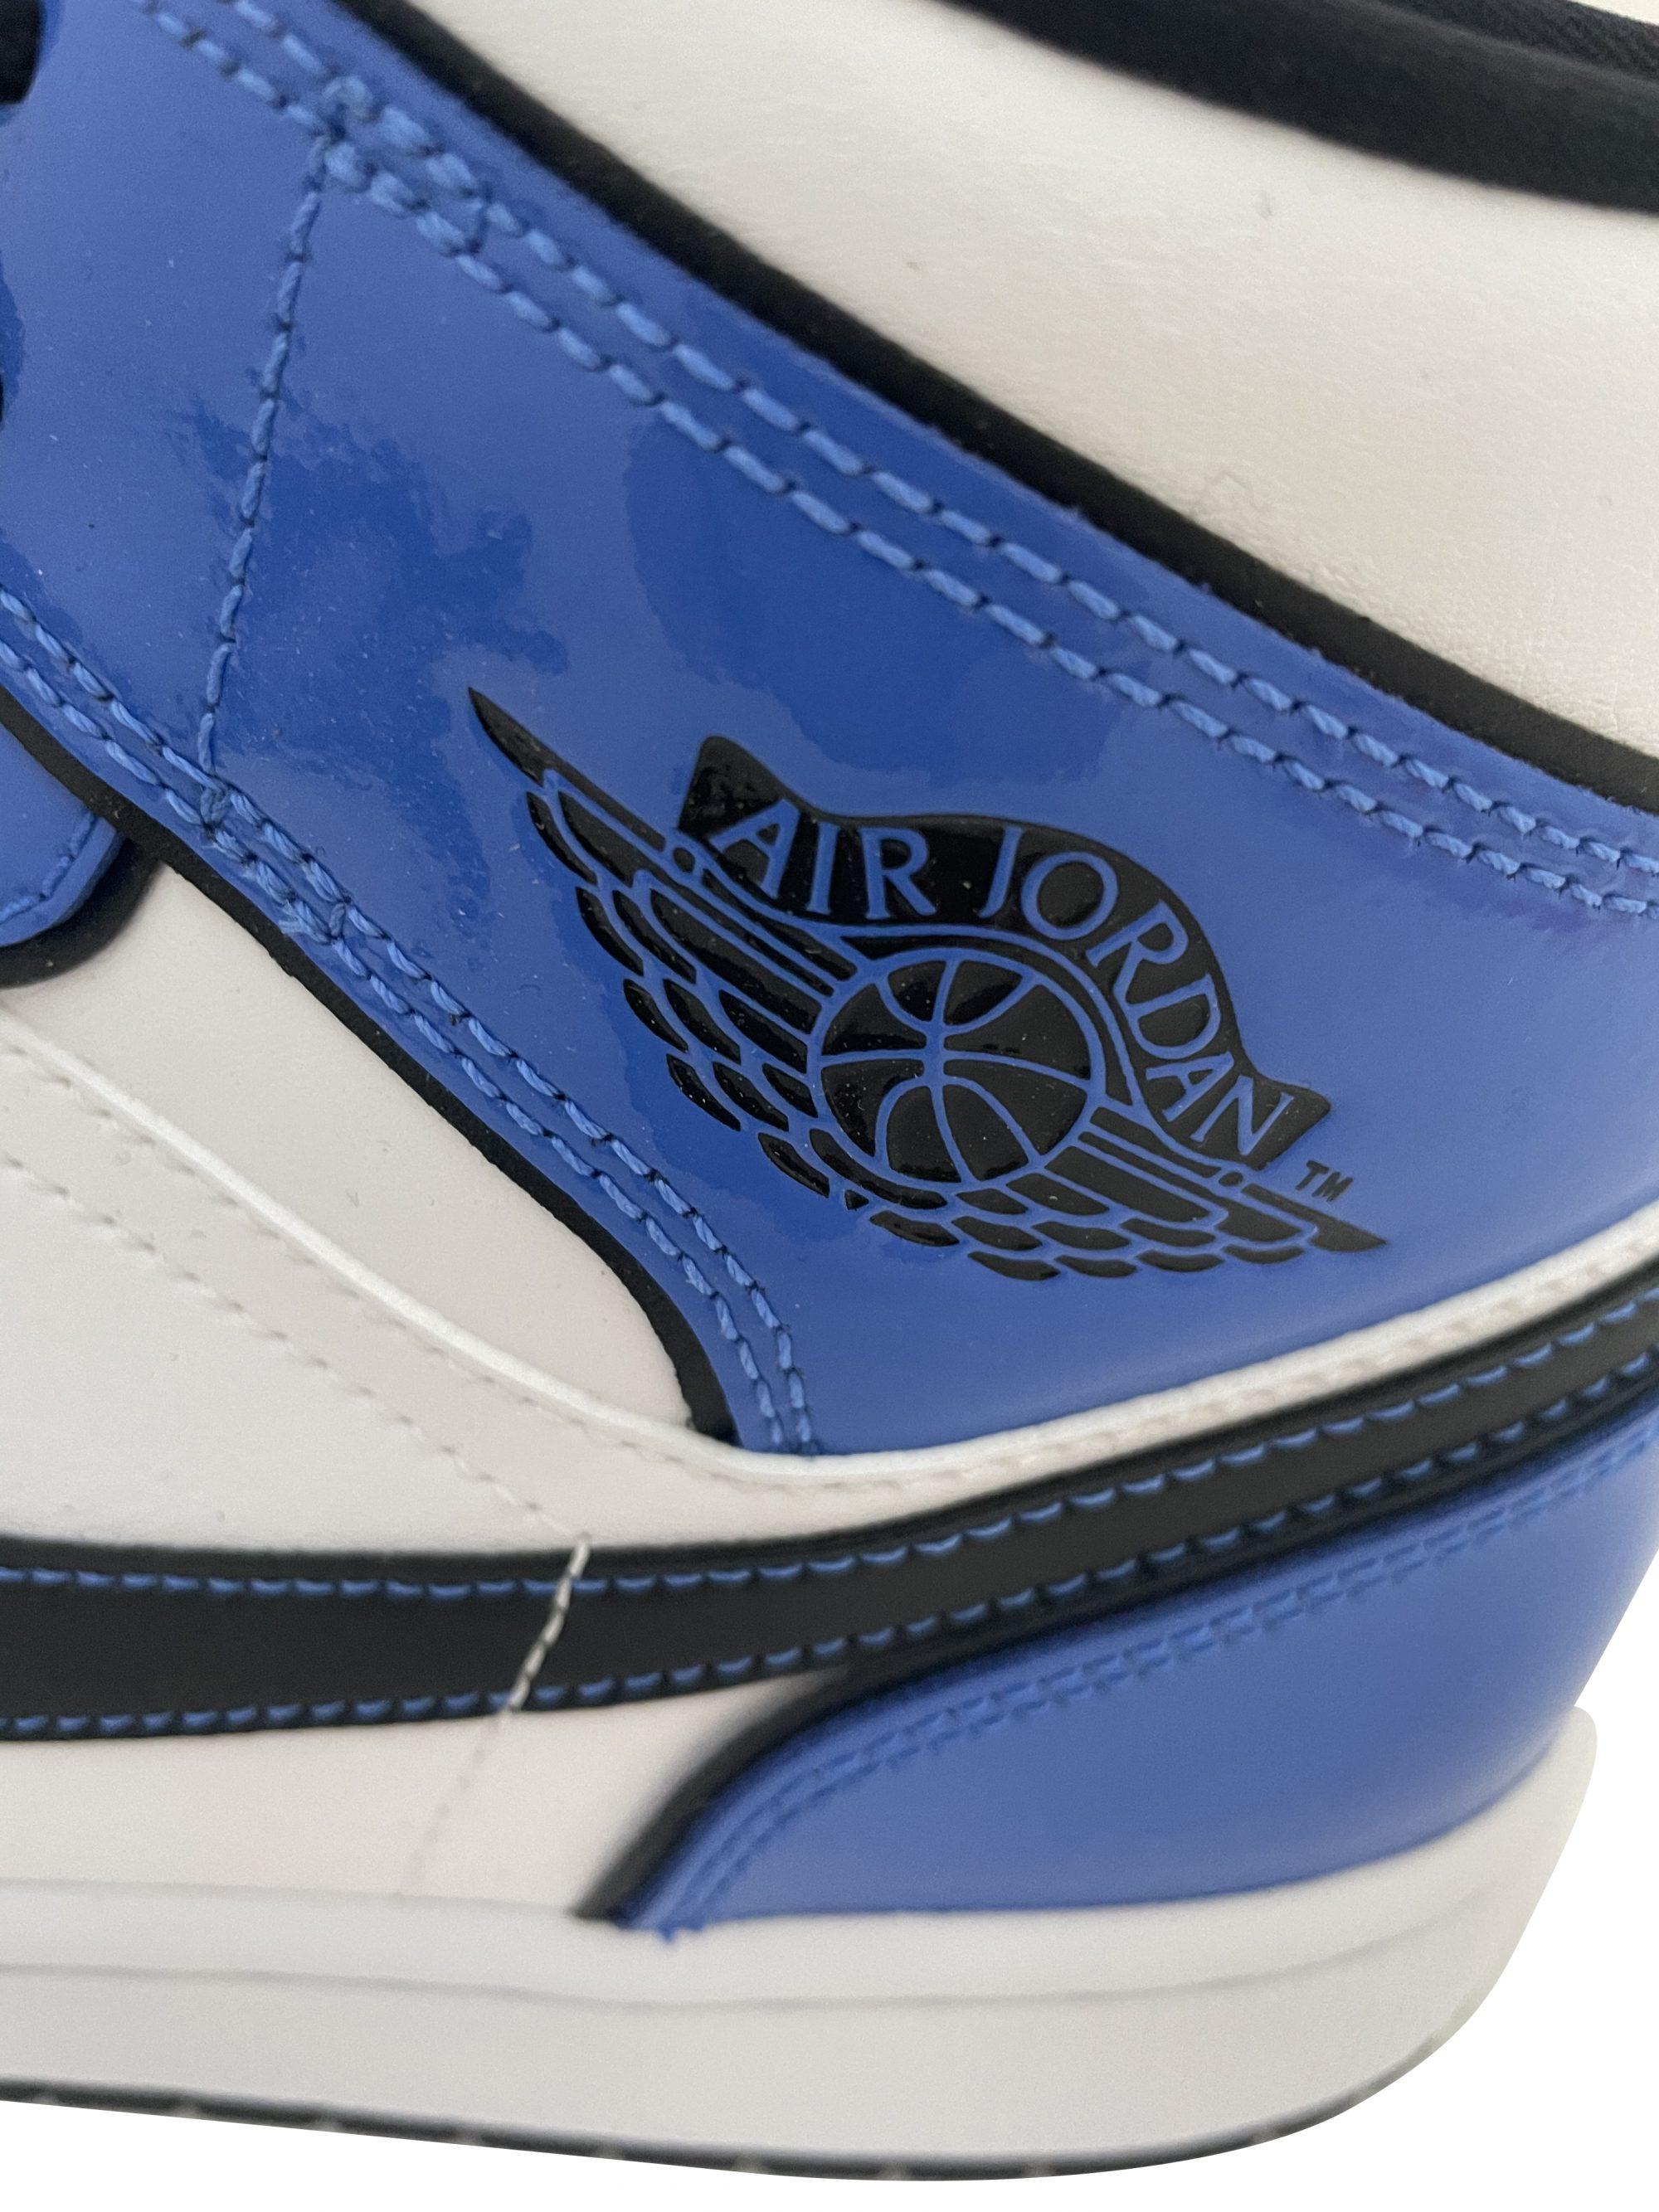 NIKE AIR JORDAN 1 MID SIGNAL BLUE DD6834 402